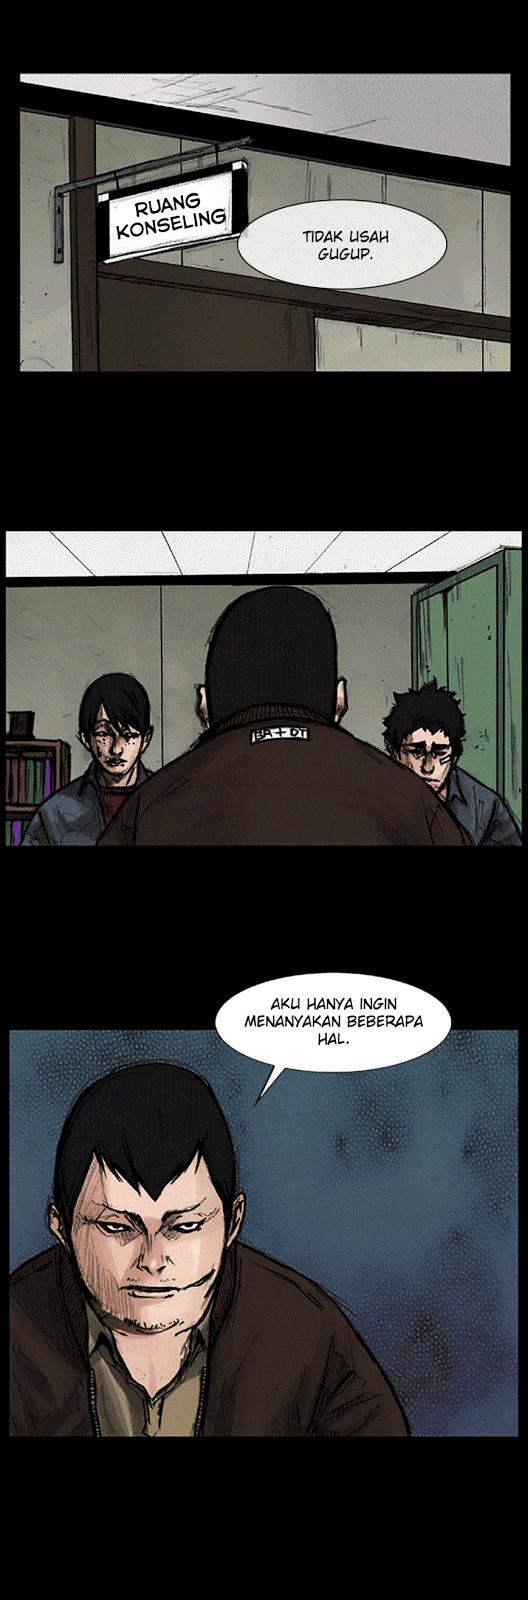 Komik dokgo 041 - chapter 41 42 Indonesia dokgo 041 - chapter 41 Terbaru 6|Baca Manga Komik Indonesia